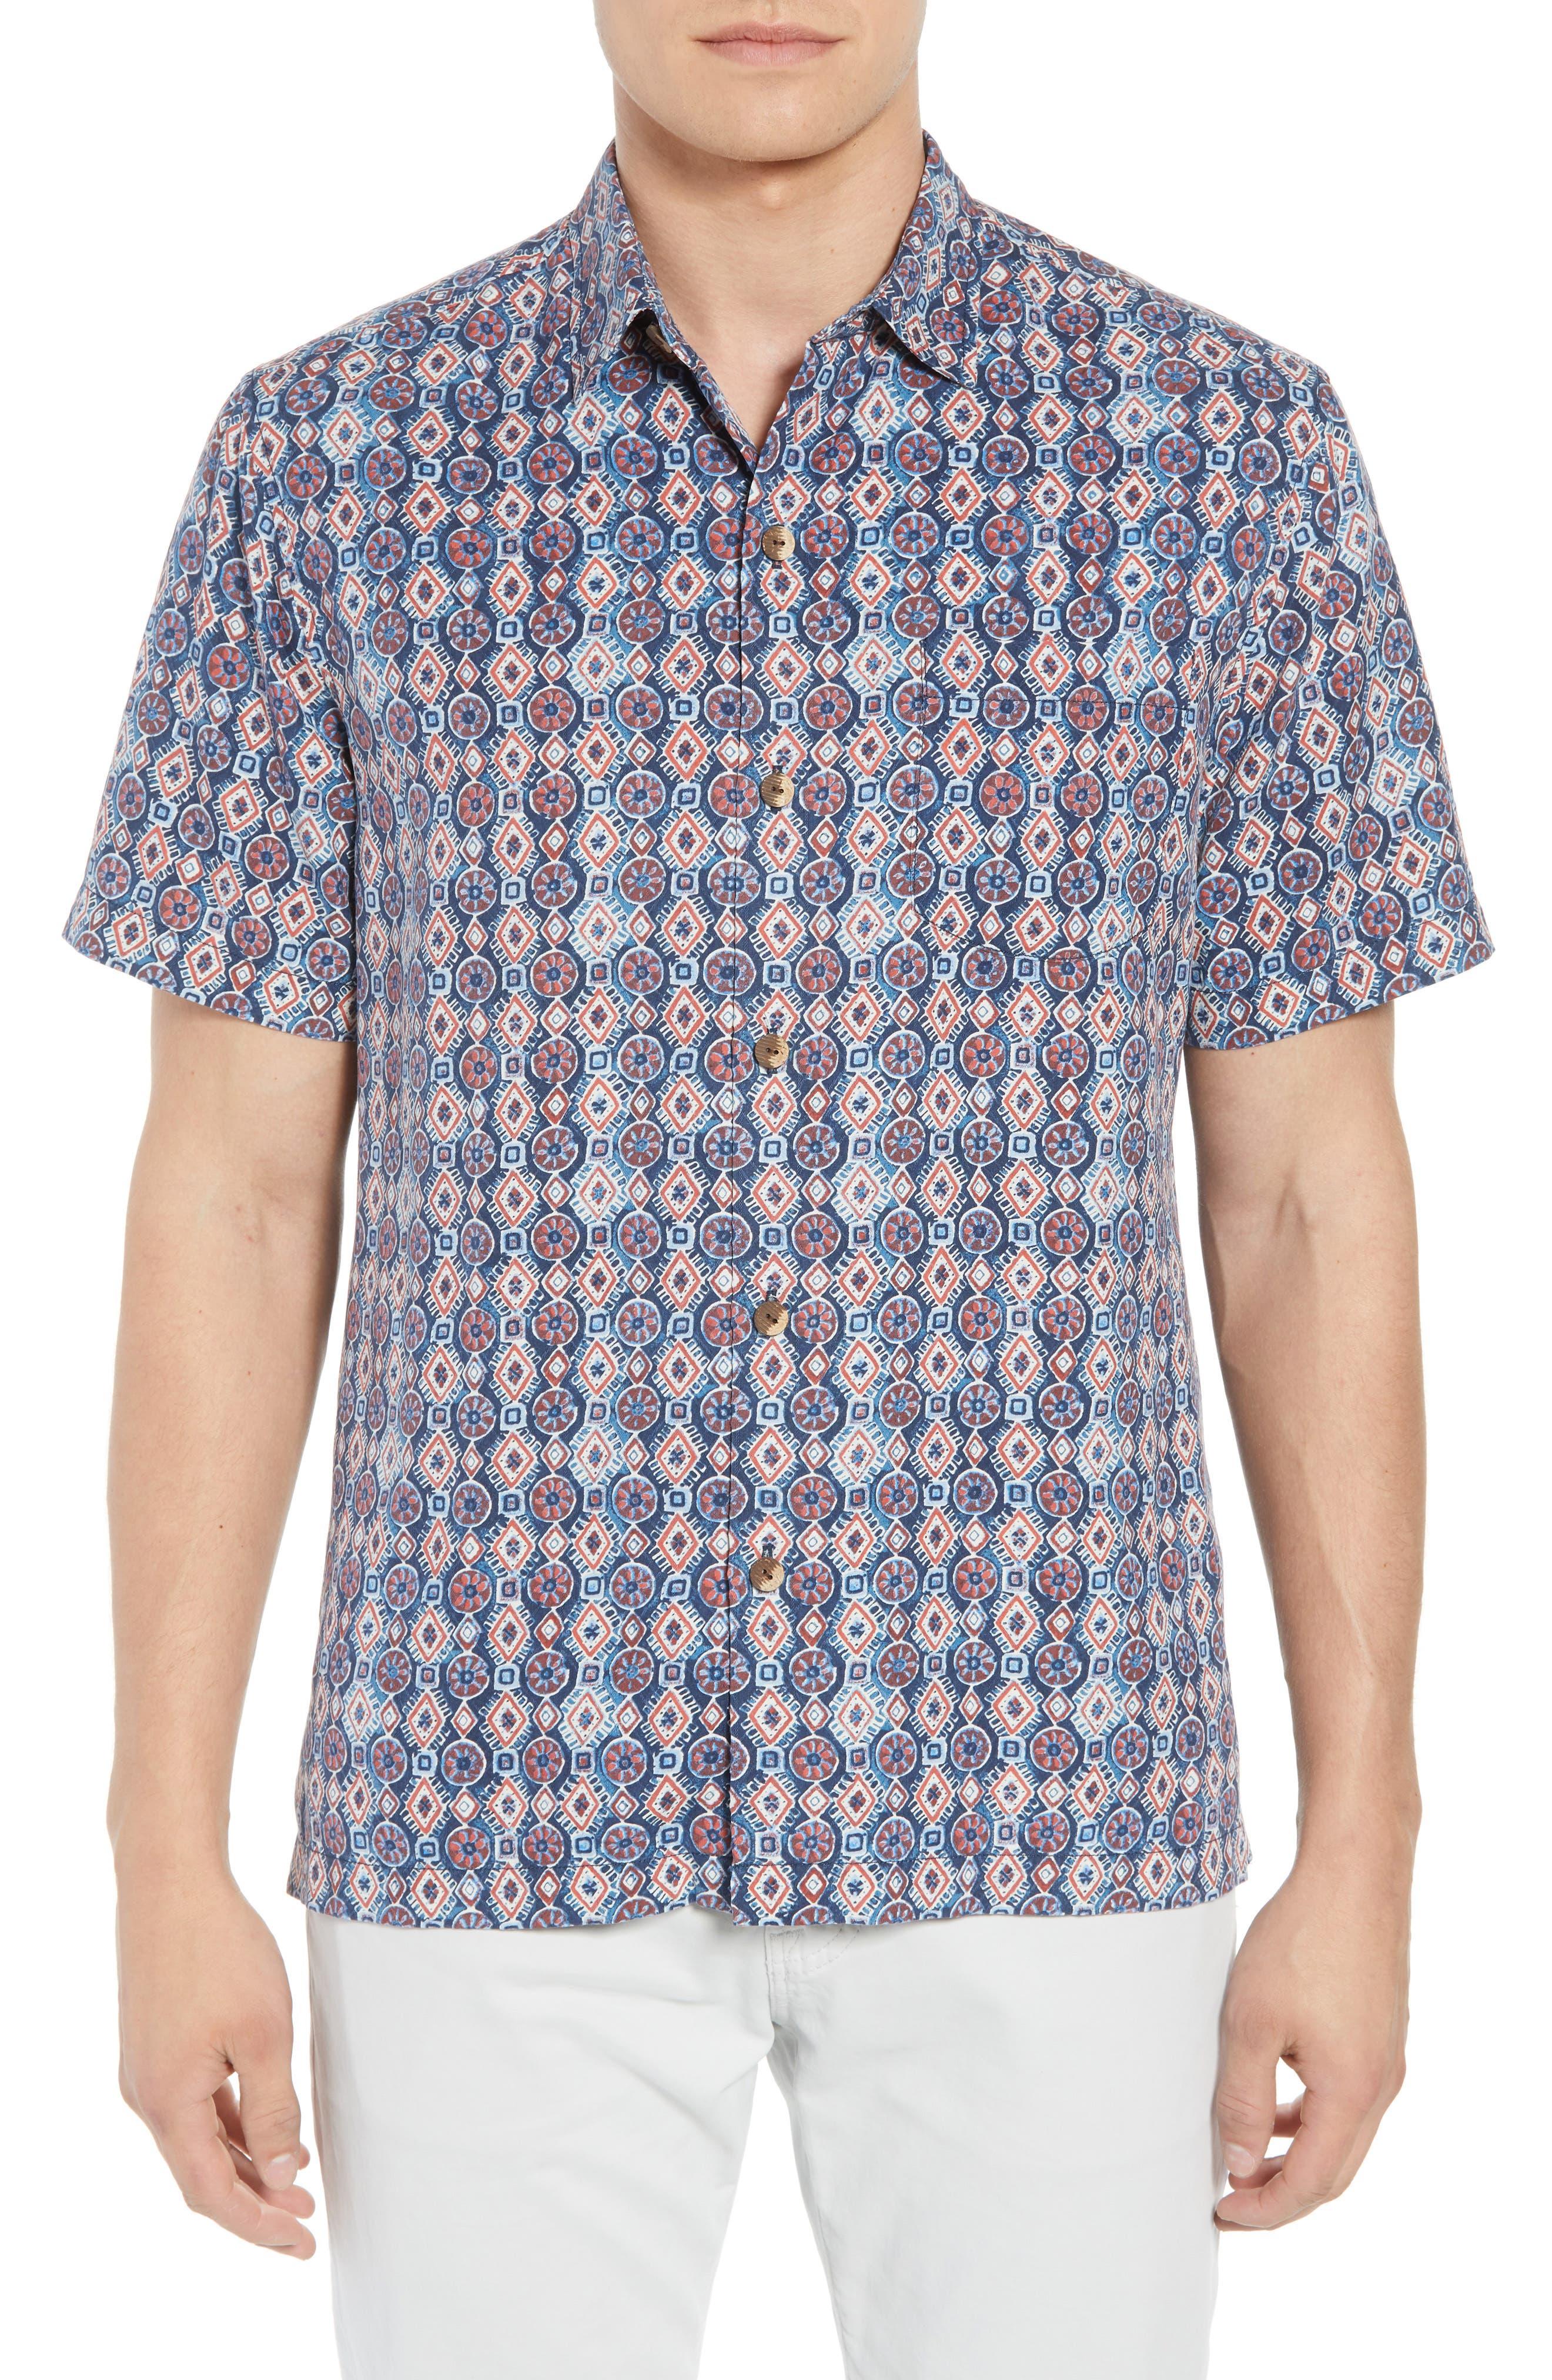 TOMMY BAHAMA,                             Tulum Tiles Silk Camp Shirt,                             Main thumbnail 1, color,                             400